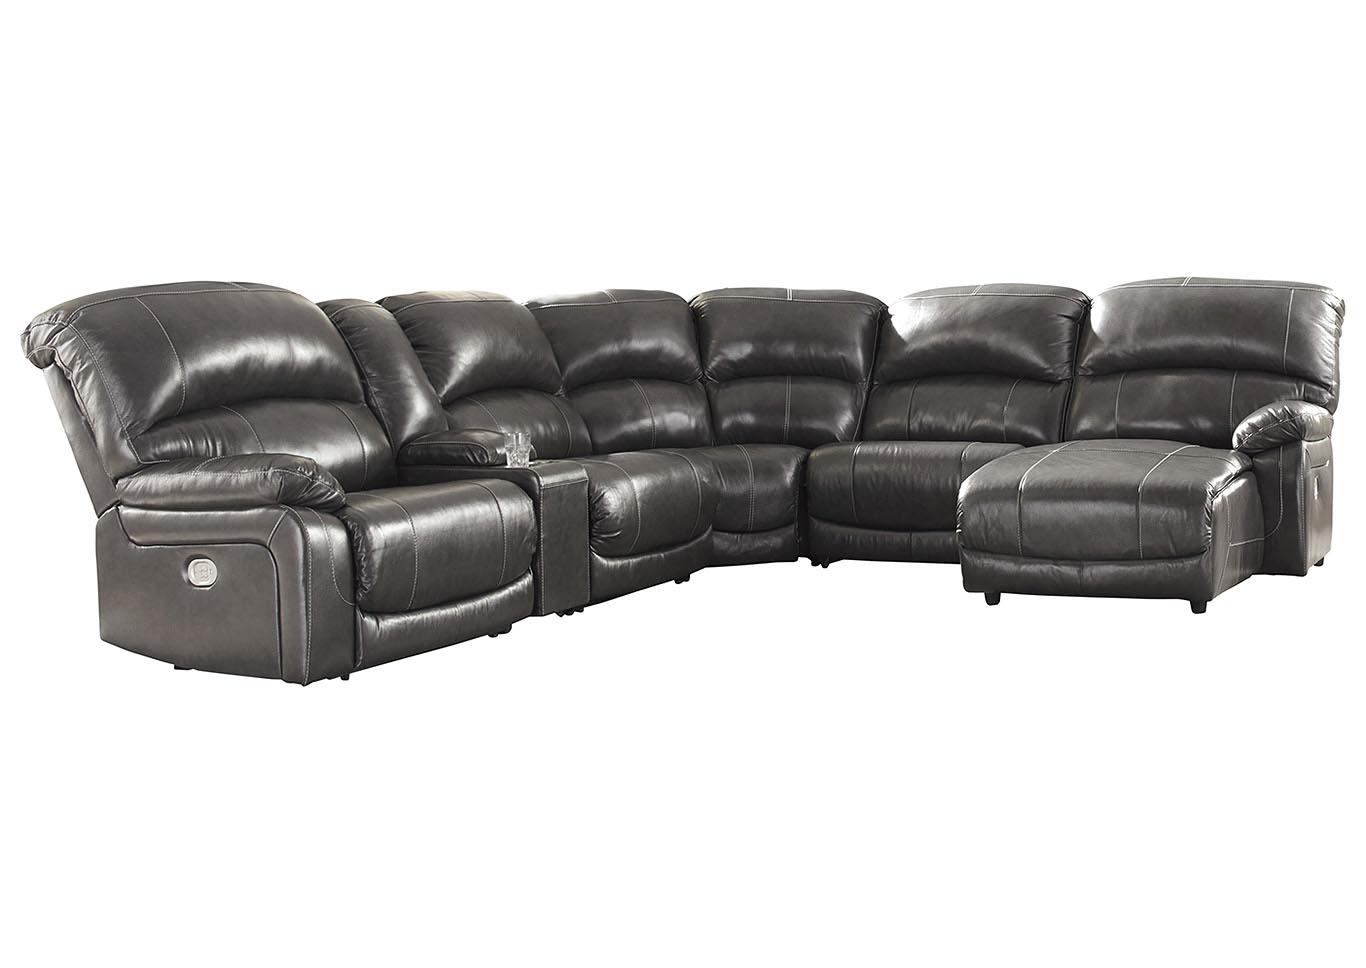 Incredible Austins Couch Potatoes Furniture Stores Austin Texas Uwap Interior Chair Design Uwaporg